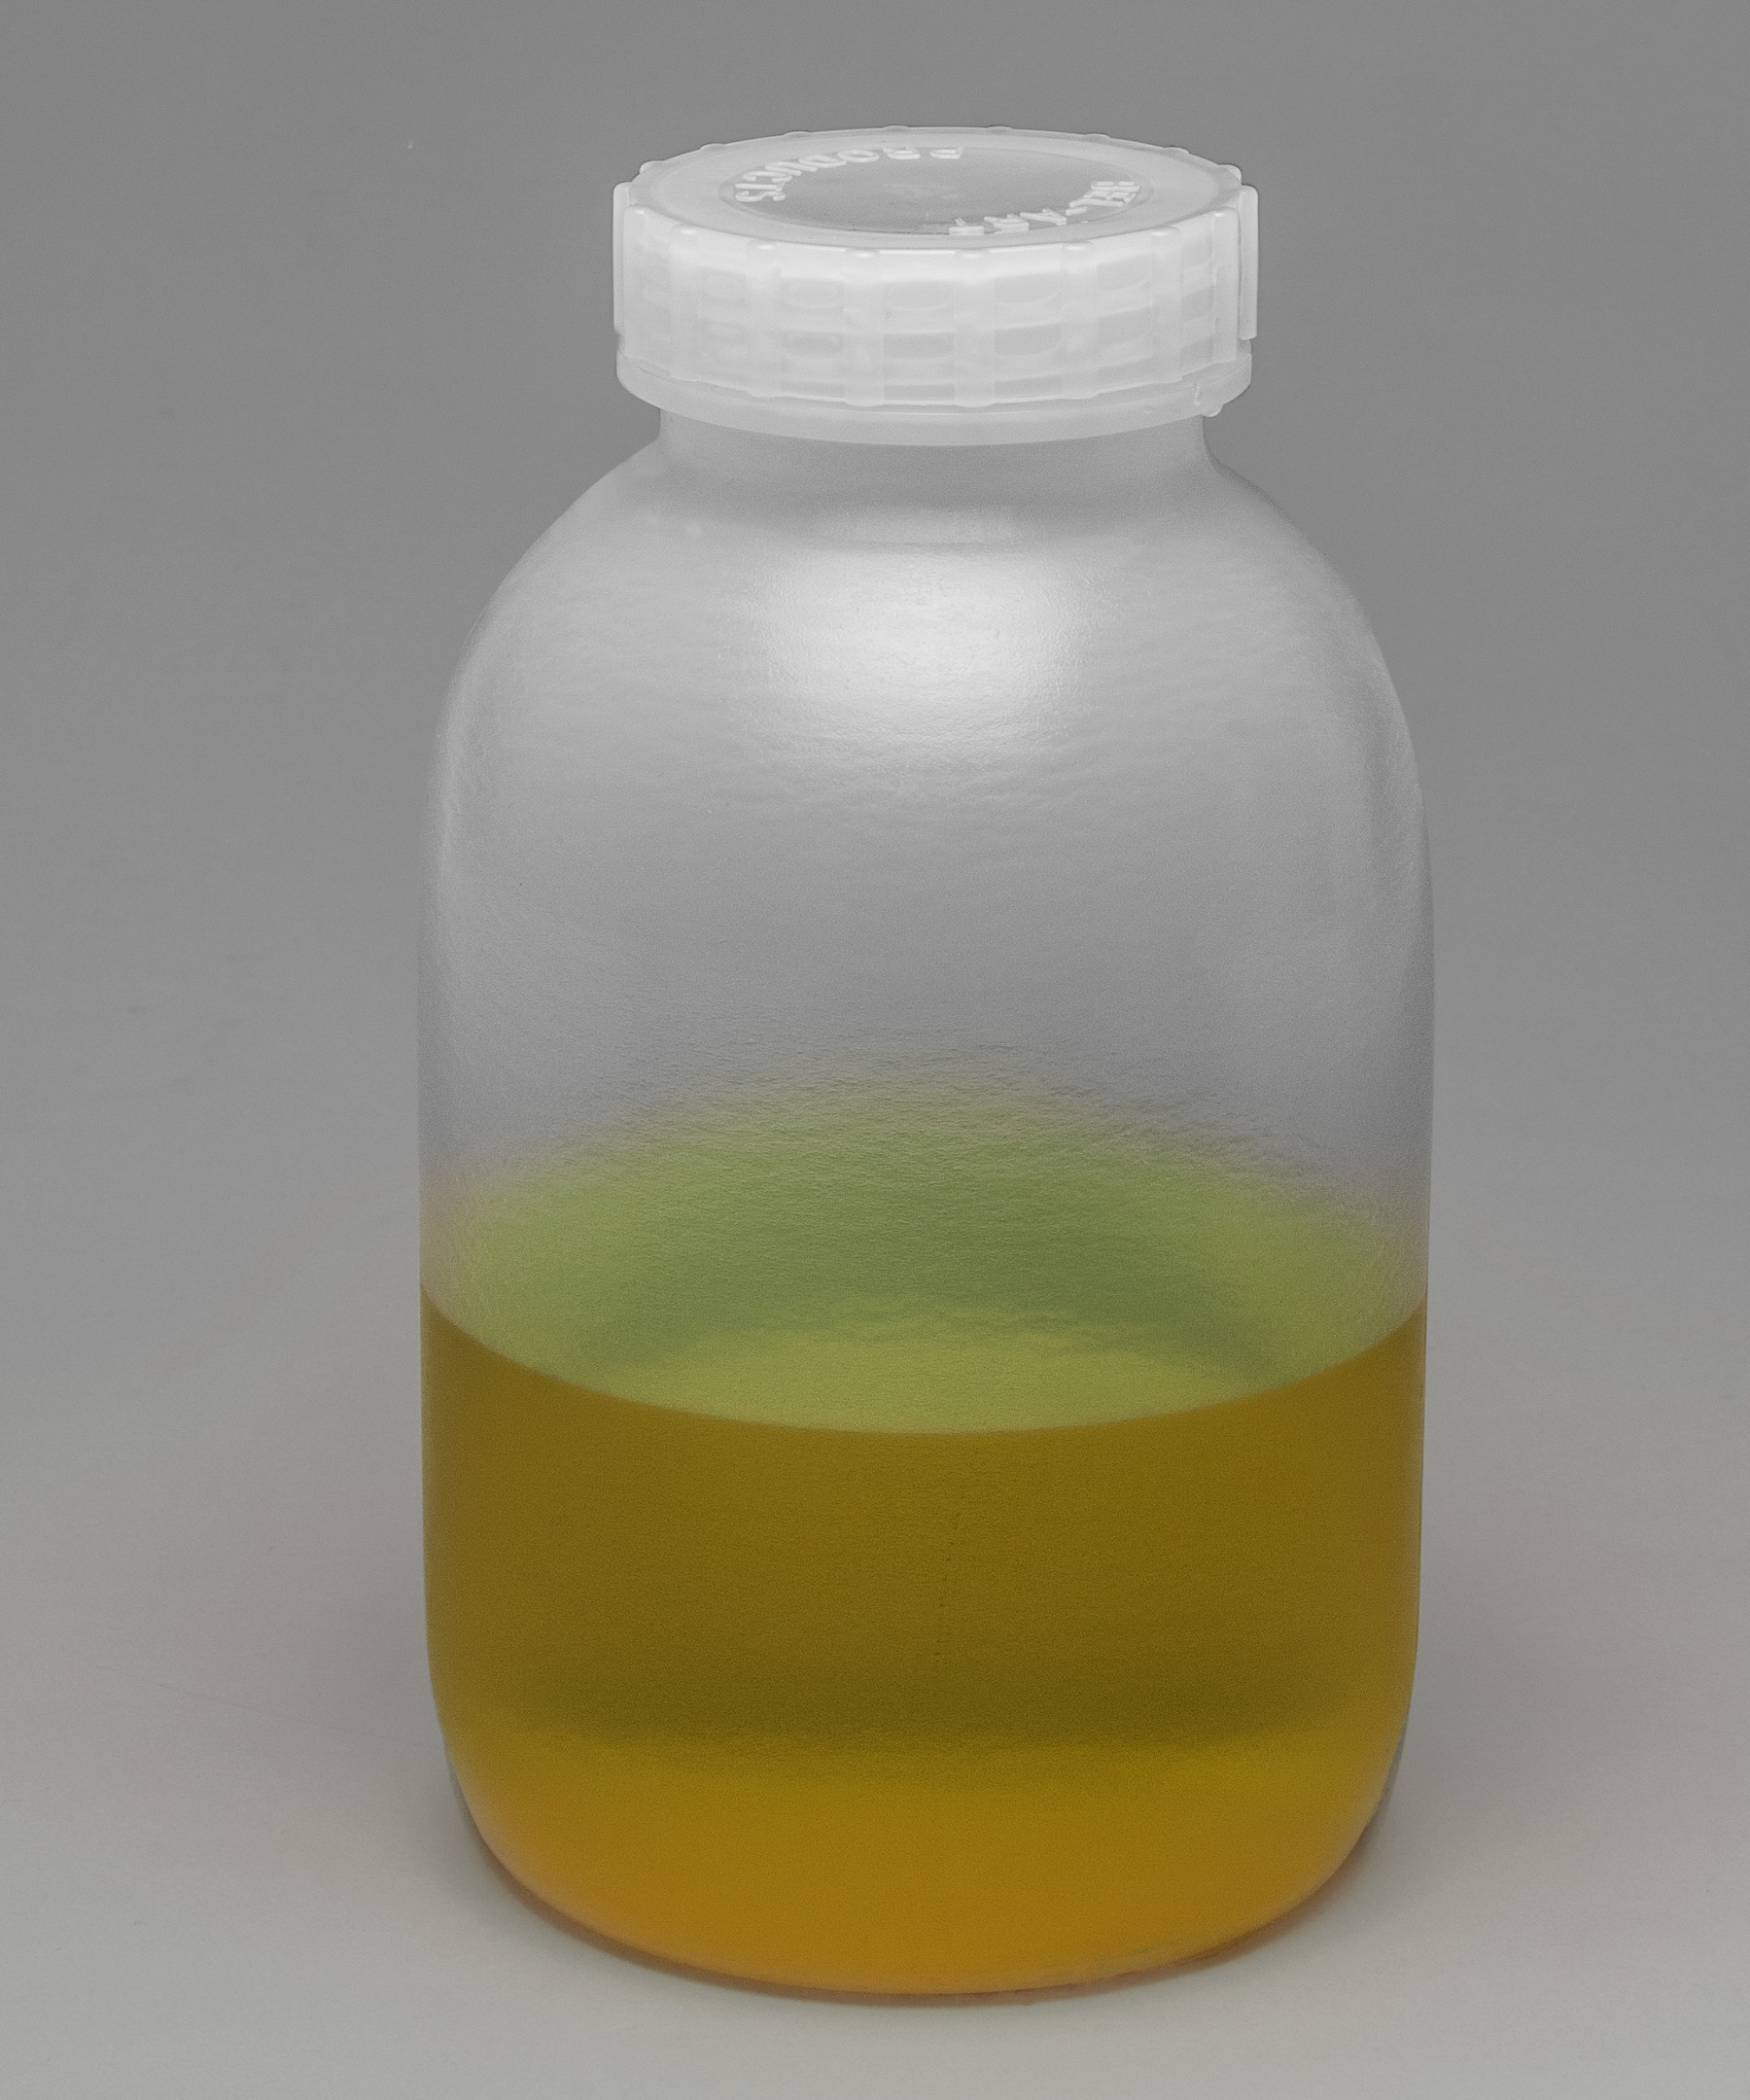 Bel-Art Wide-Mouth 2 L (½ gal) Polypropylene Mason Jars (Pack of 3)